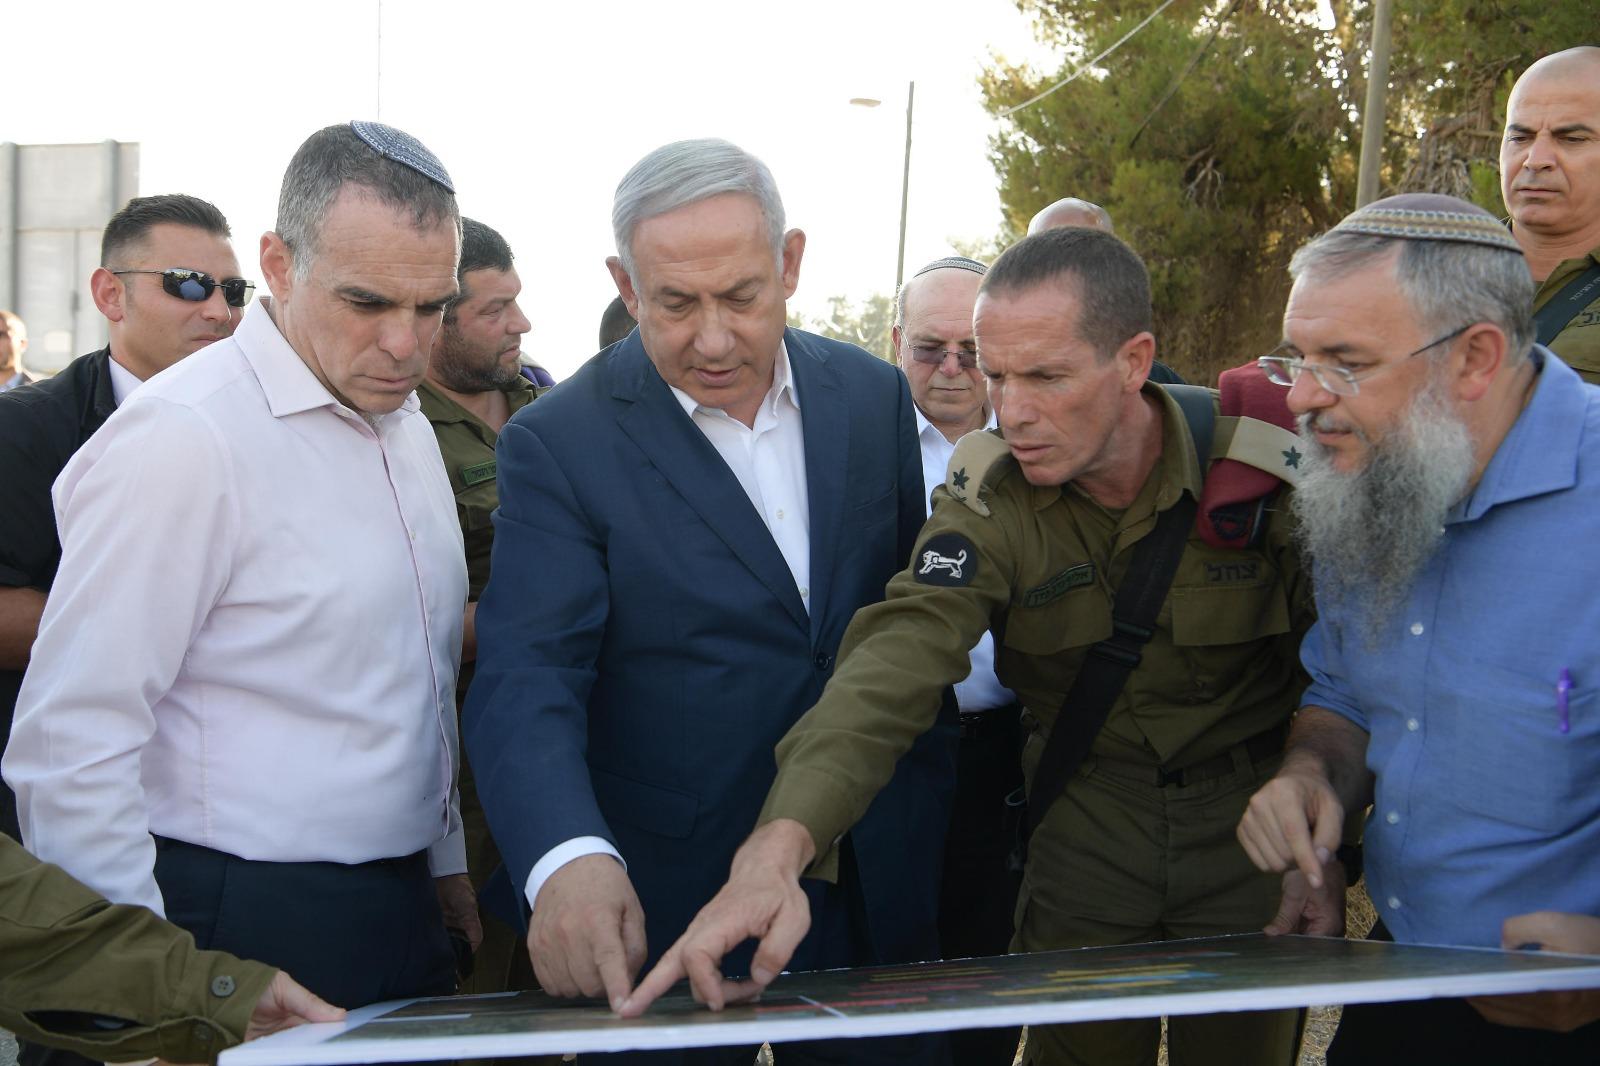 PM Netanyahu with Efrat Mayor Oded Ravivi and Gush Etzion Mayor Shlomo Neeman Photo credit Amos Ben-Gershom GPO